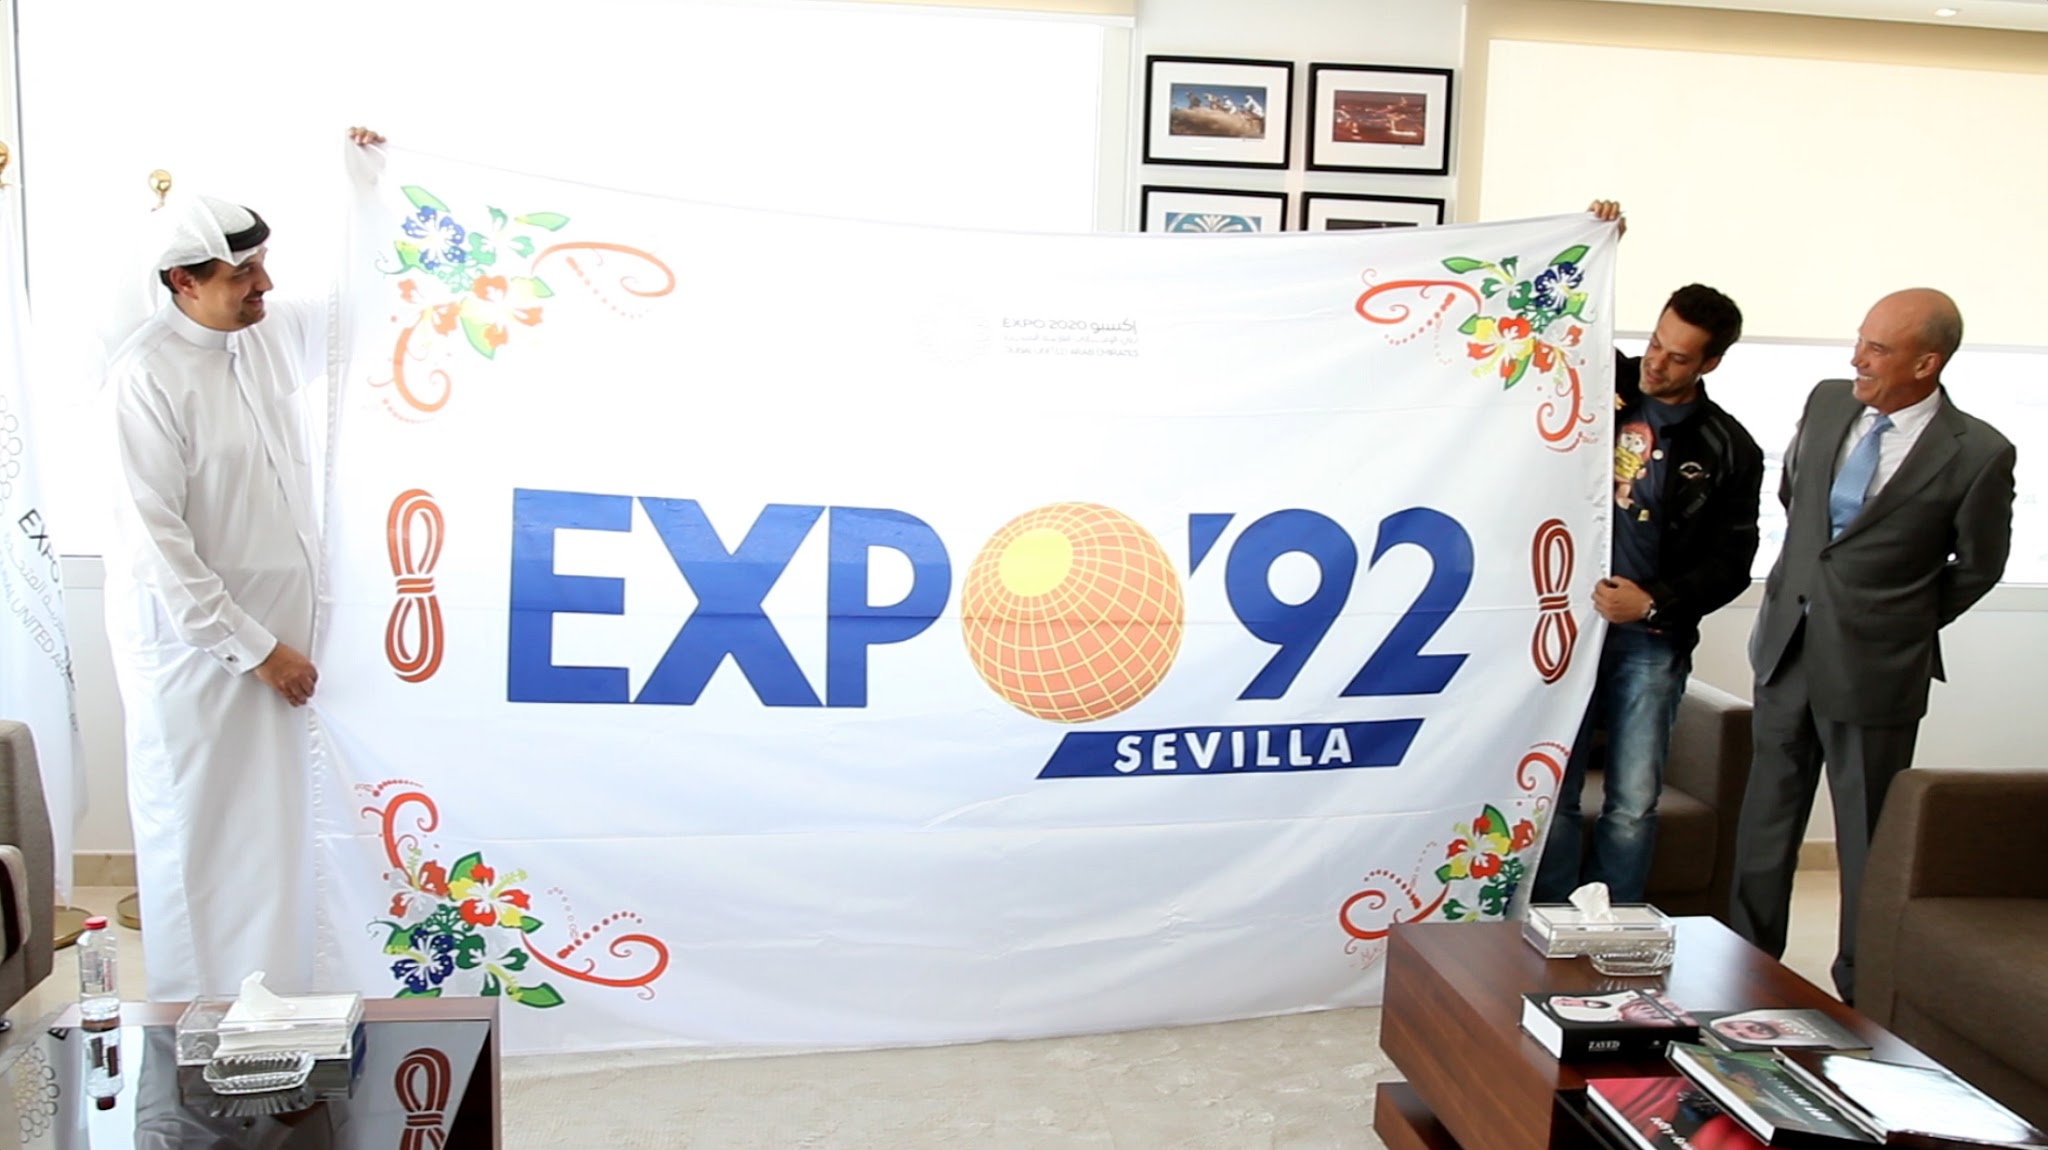 bandera expo 92 dubai